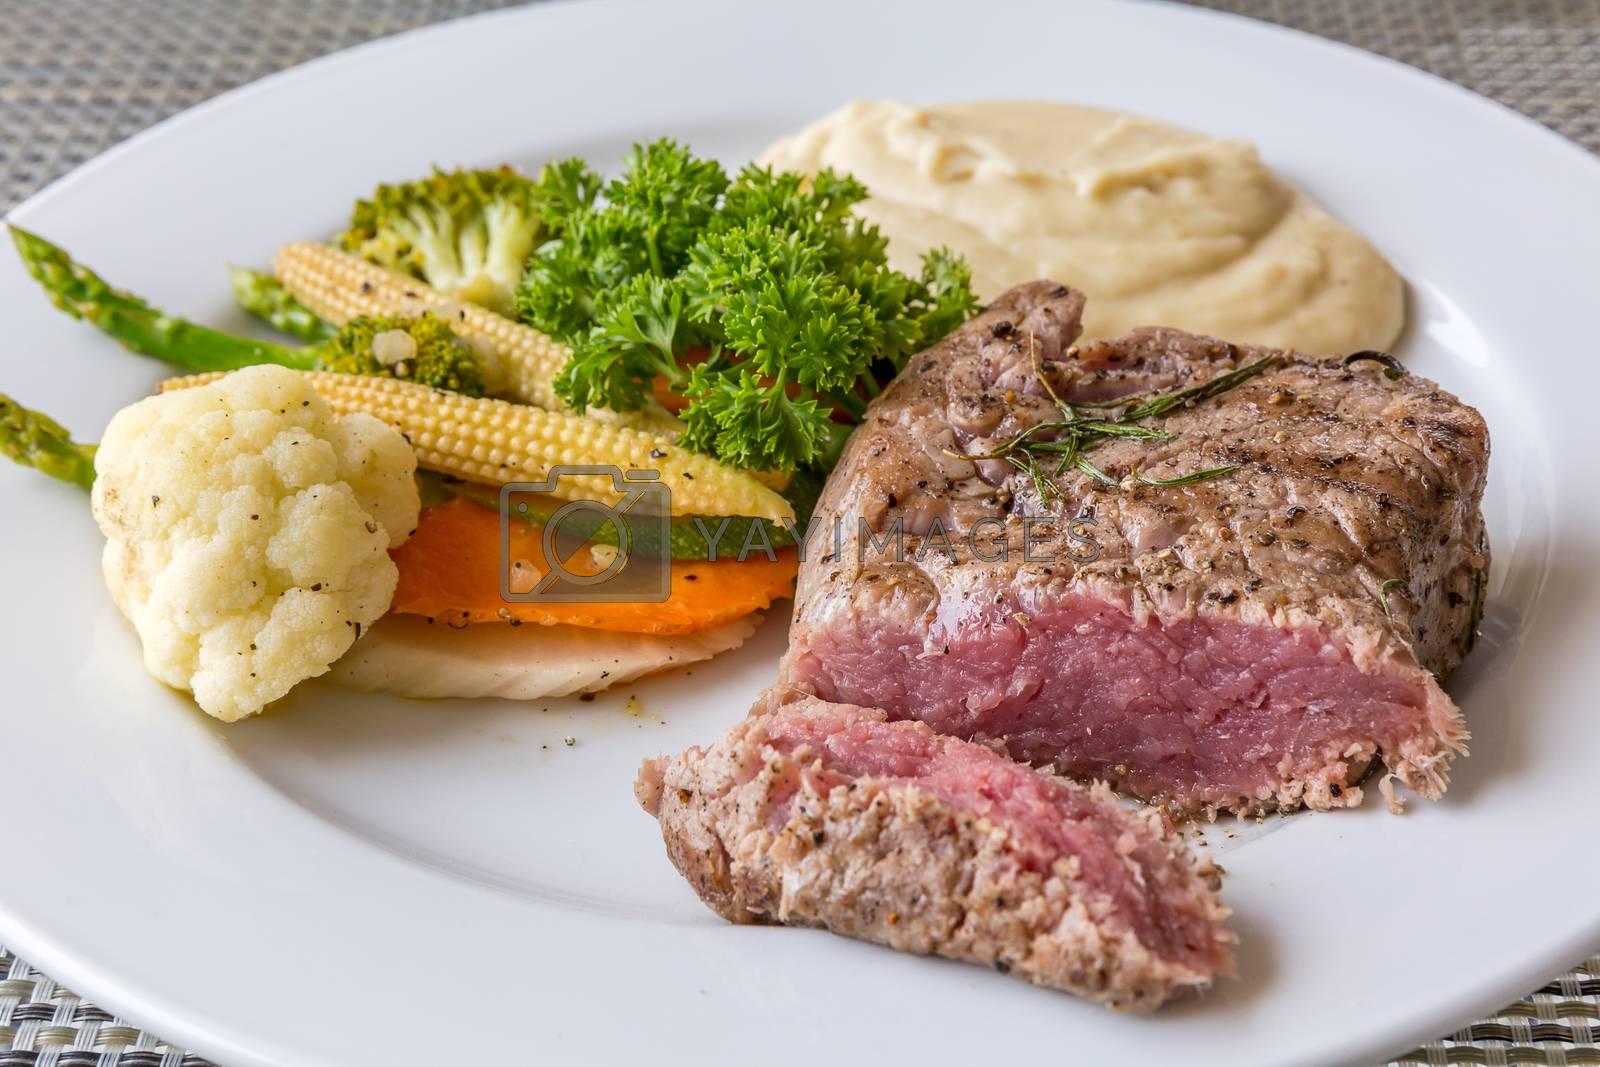 grilled fillet steak served with grilled vegetable and mash potato